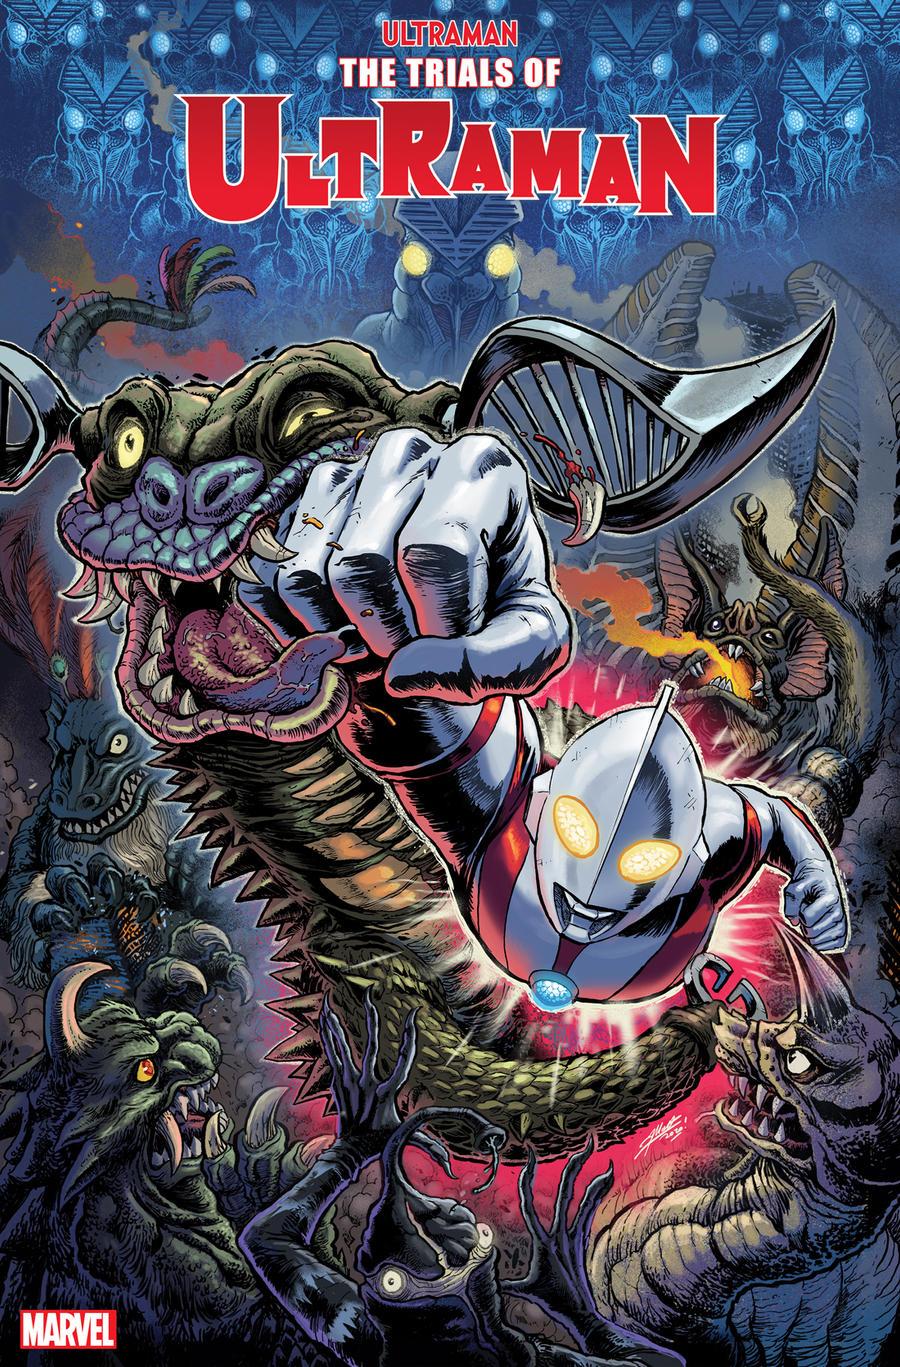 TRIALS OF ULTRAMAN Cover #1 Marvel